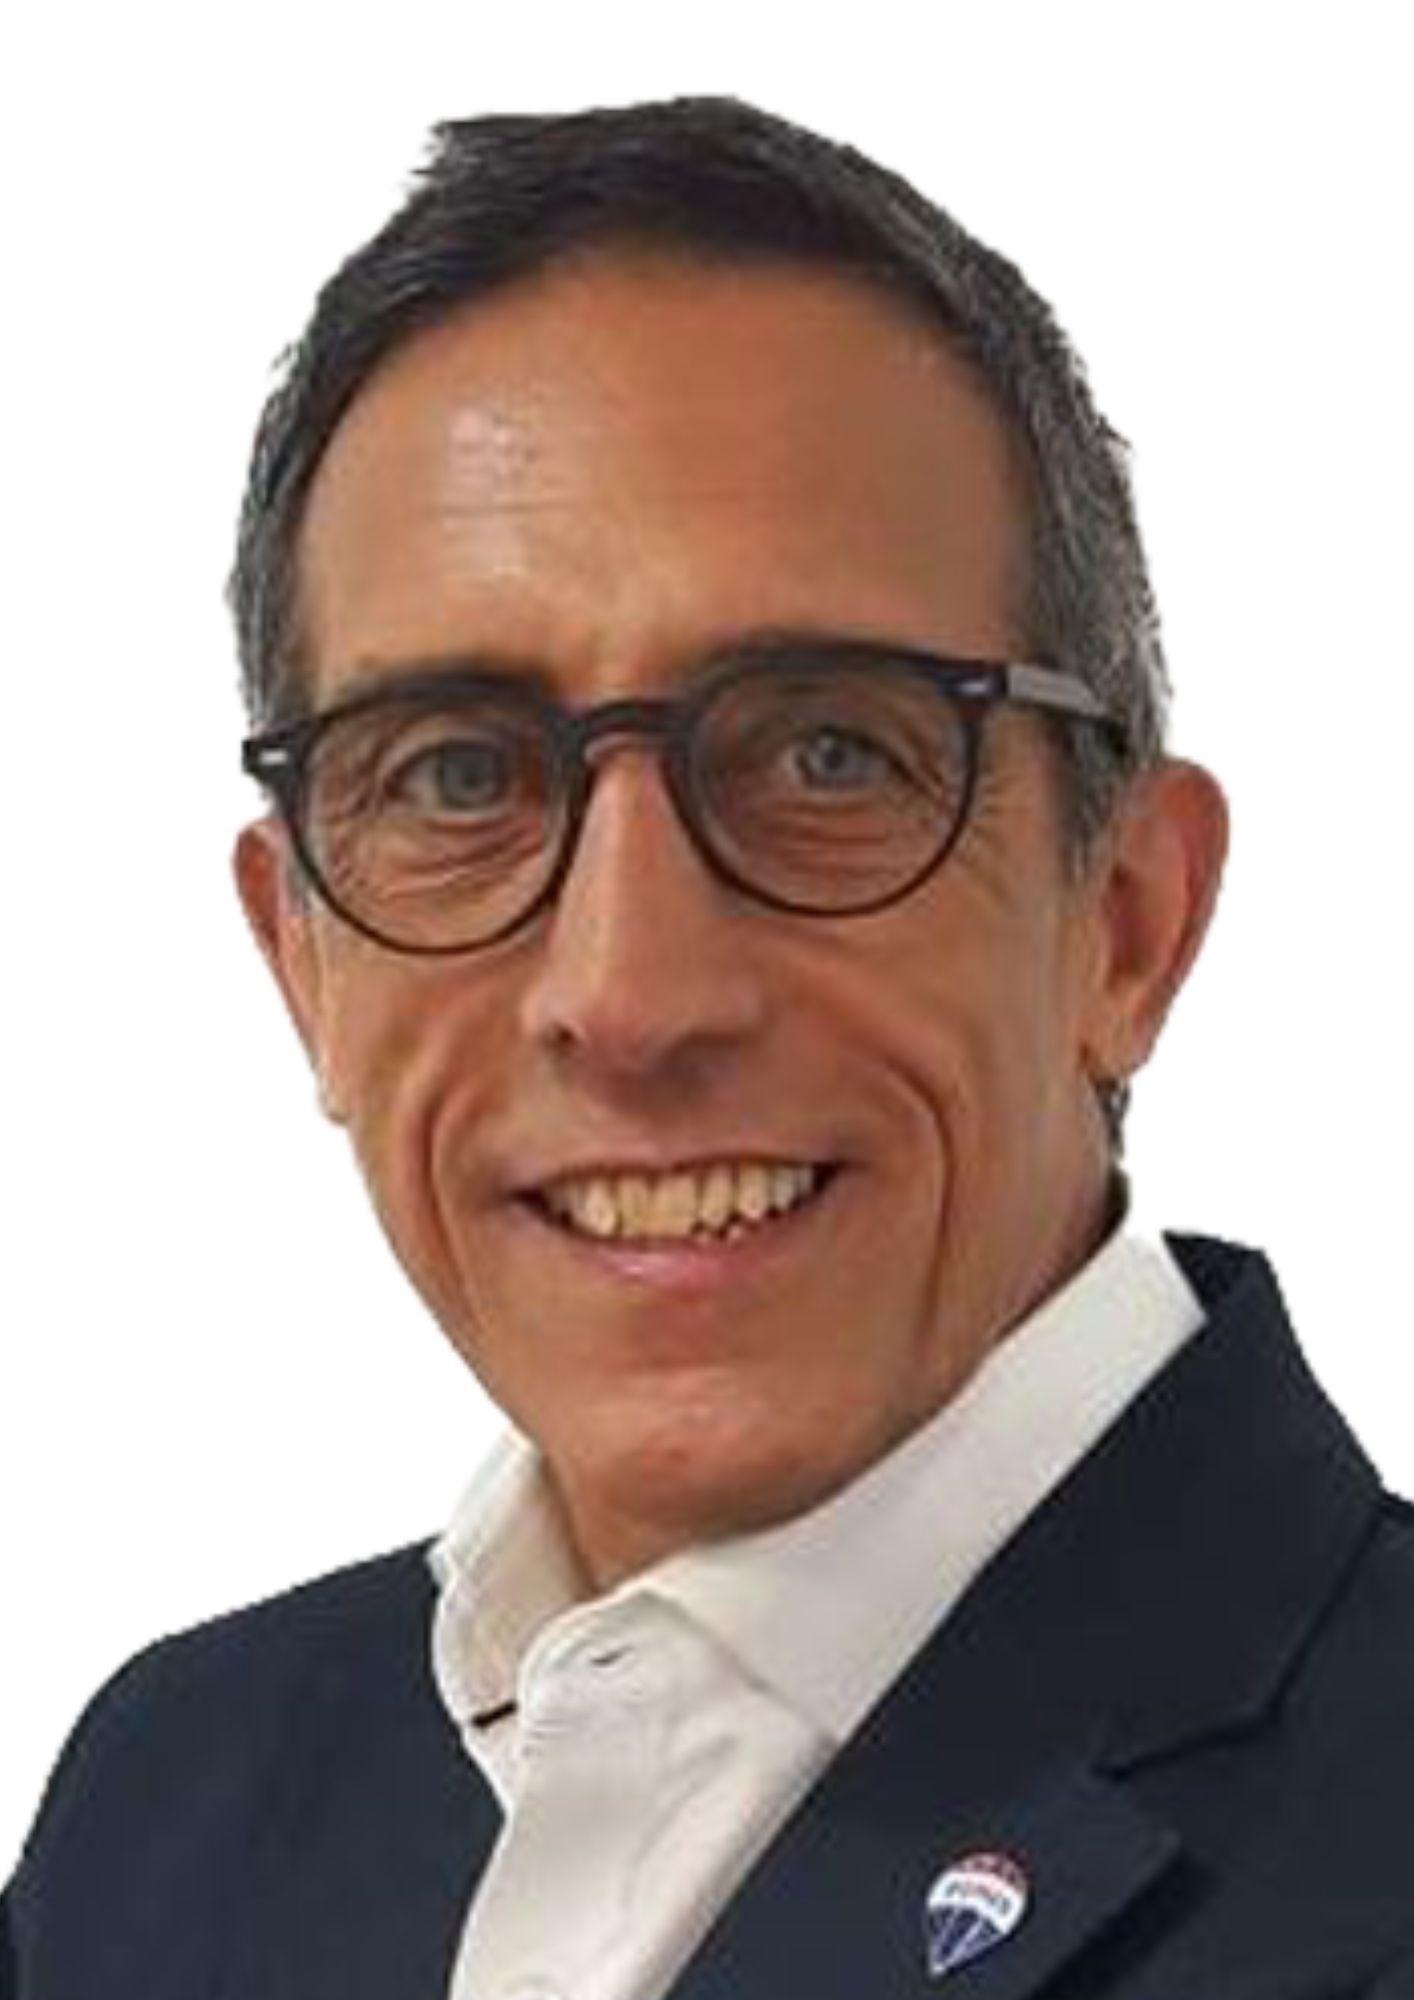 Gerardo Claudio Paez López